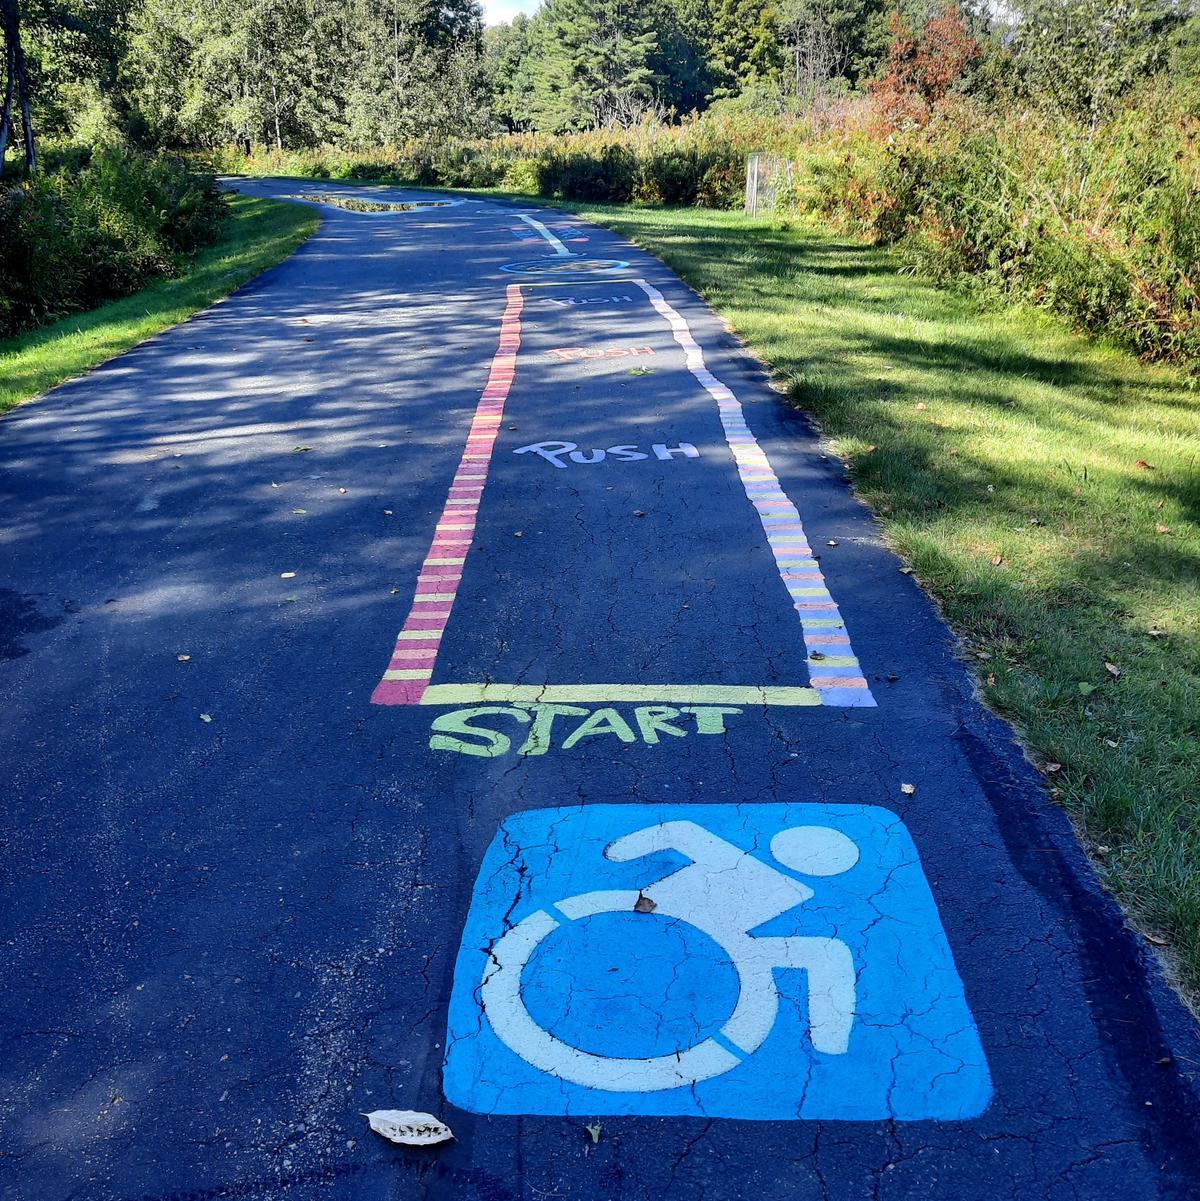 The start of the wheelchair course. Photo credit: Enock Glidden